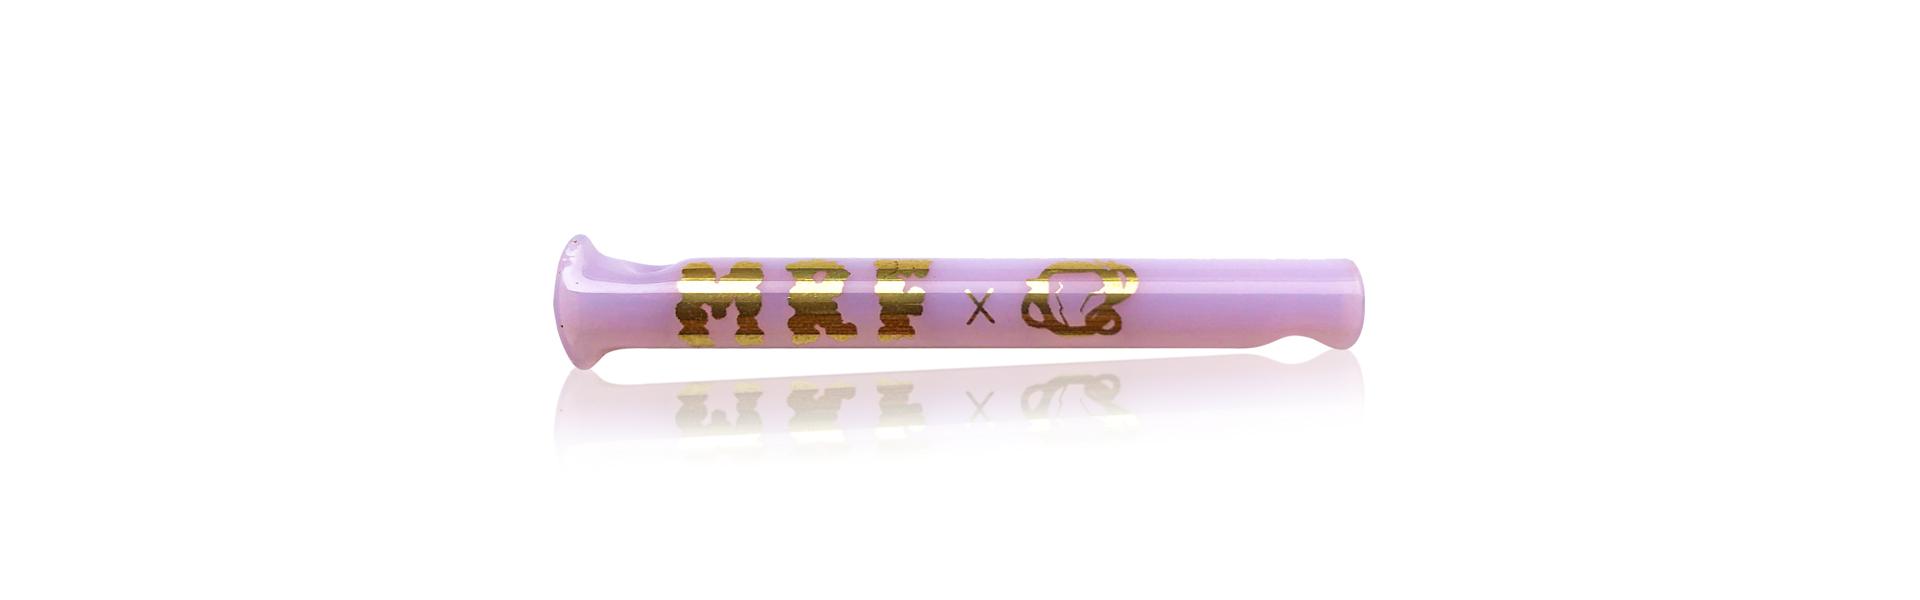 Piteira de Vidro Mr. Fumo x Low Pressure 24k (Coloridas)  - Mr. Fumo